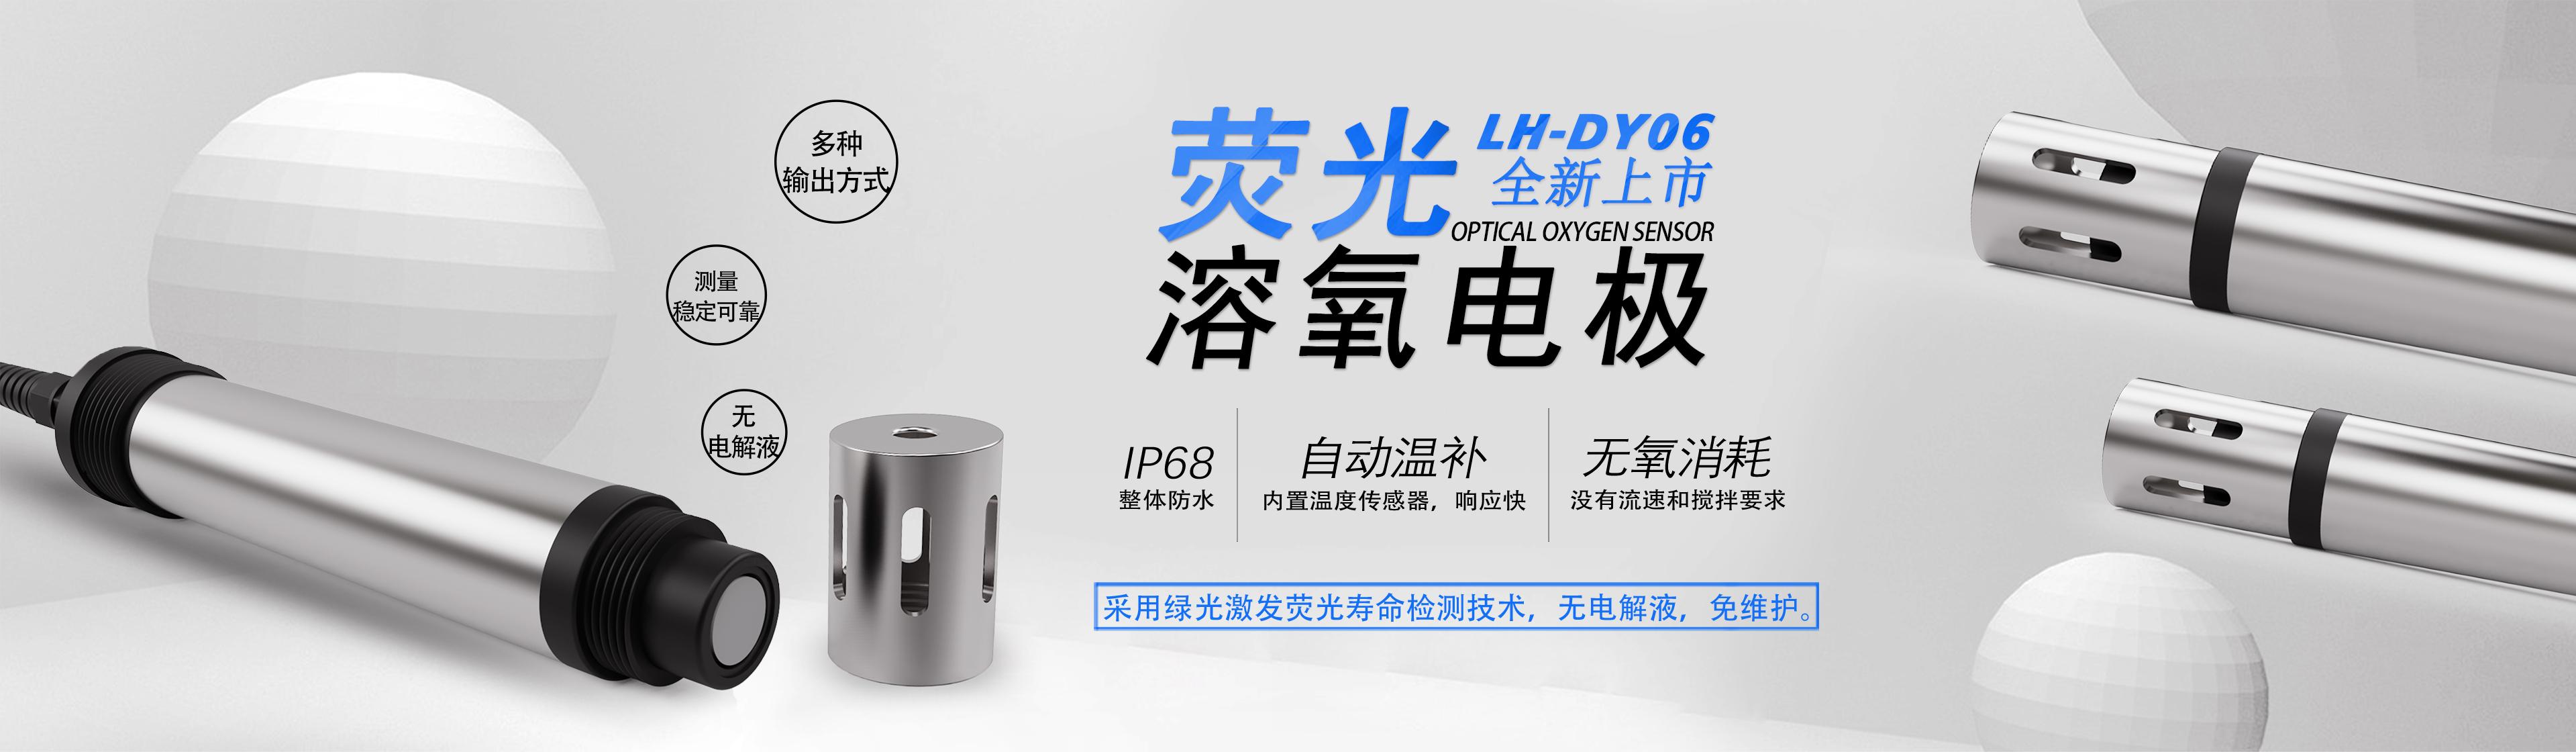 banner-熒光溶氧電極LH-DY0